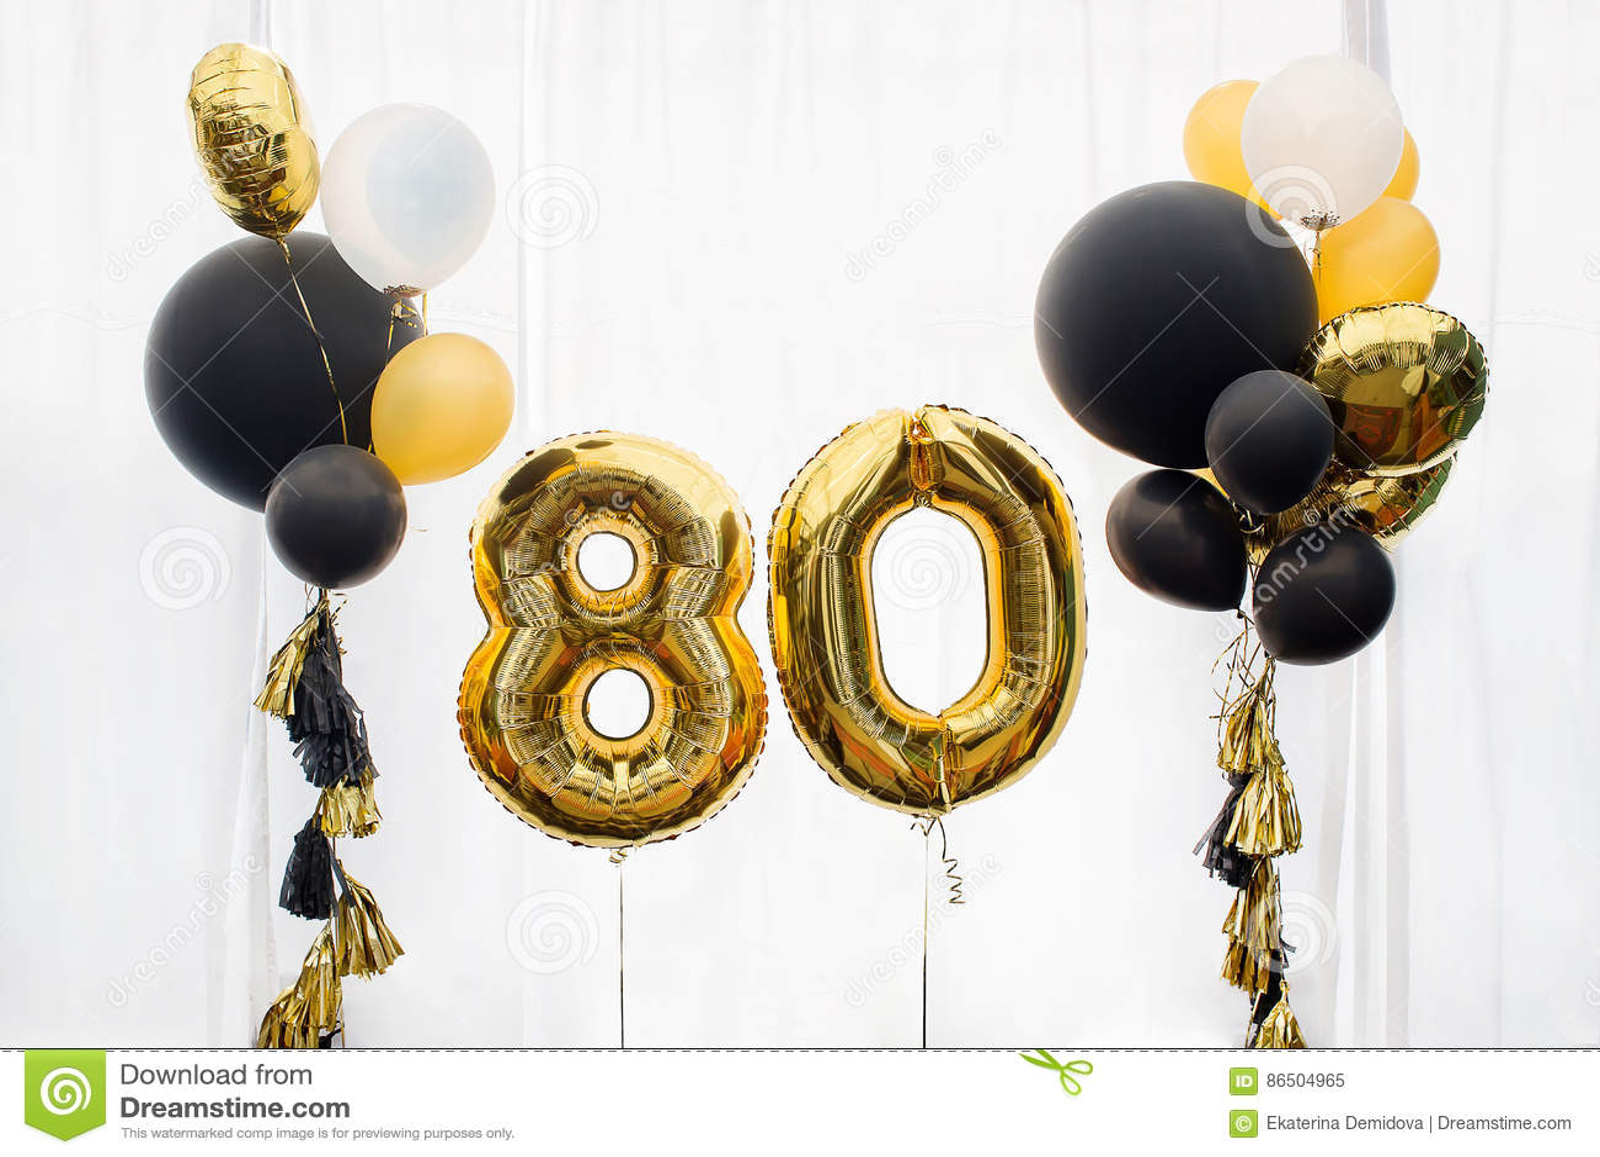 Decoration for 80 years birthday, anniversary